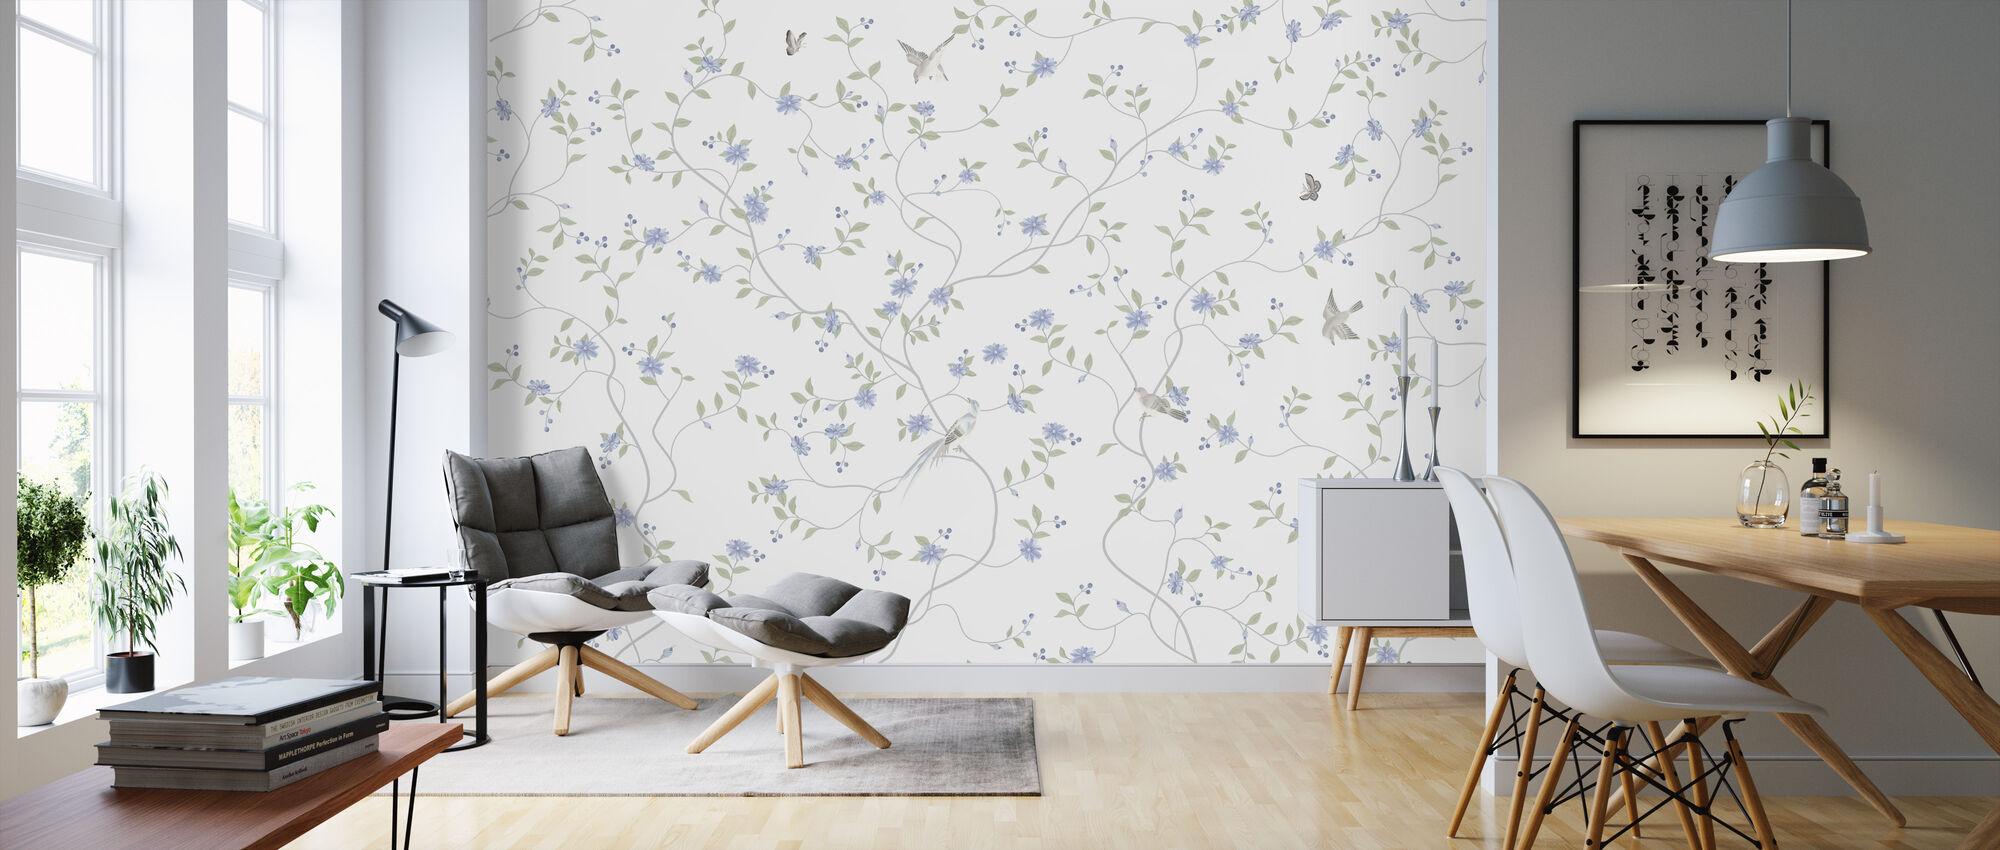 Birds and Flowers Bliss - Wallpaper - Living Room